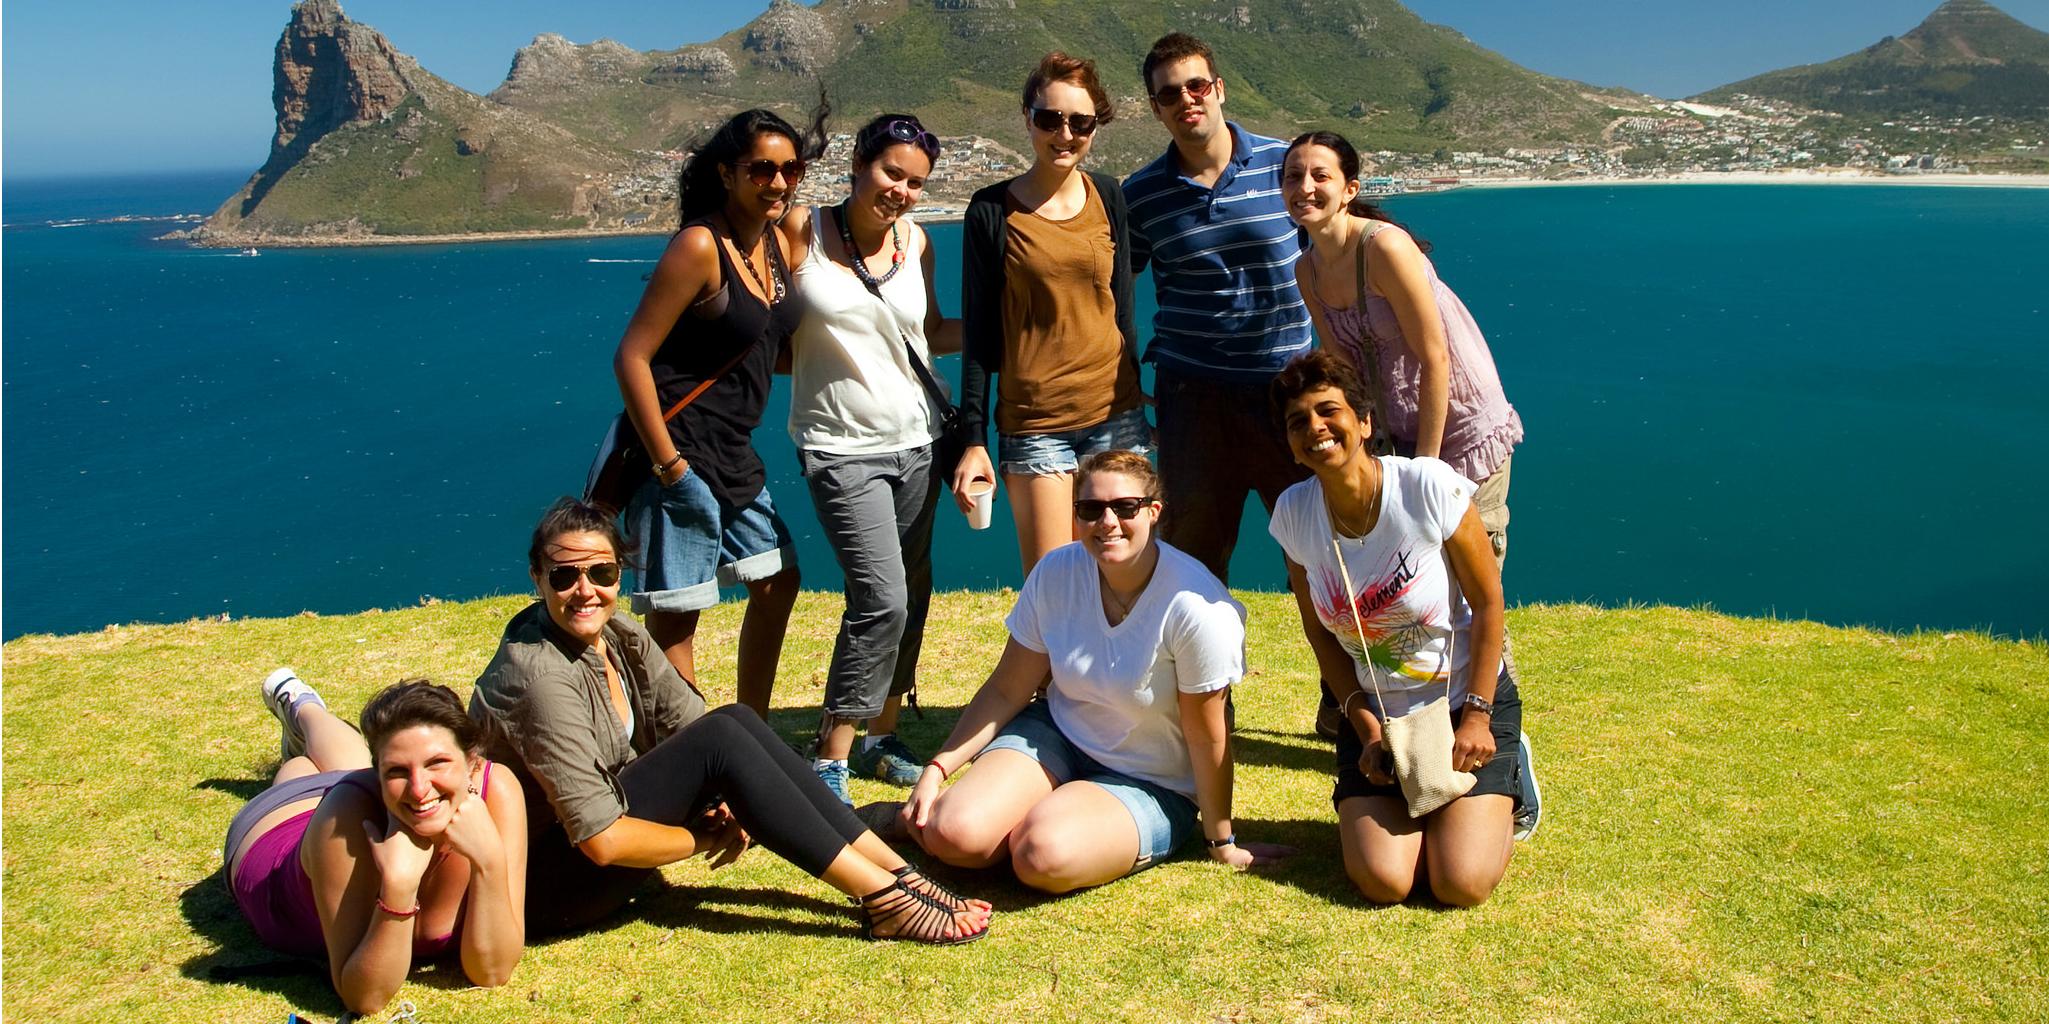 Make international friends on a gap year abroad.